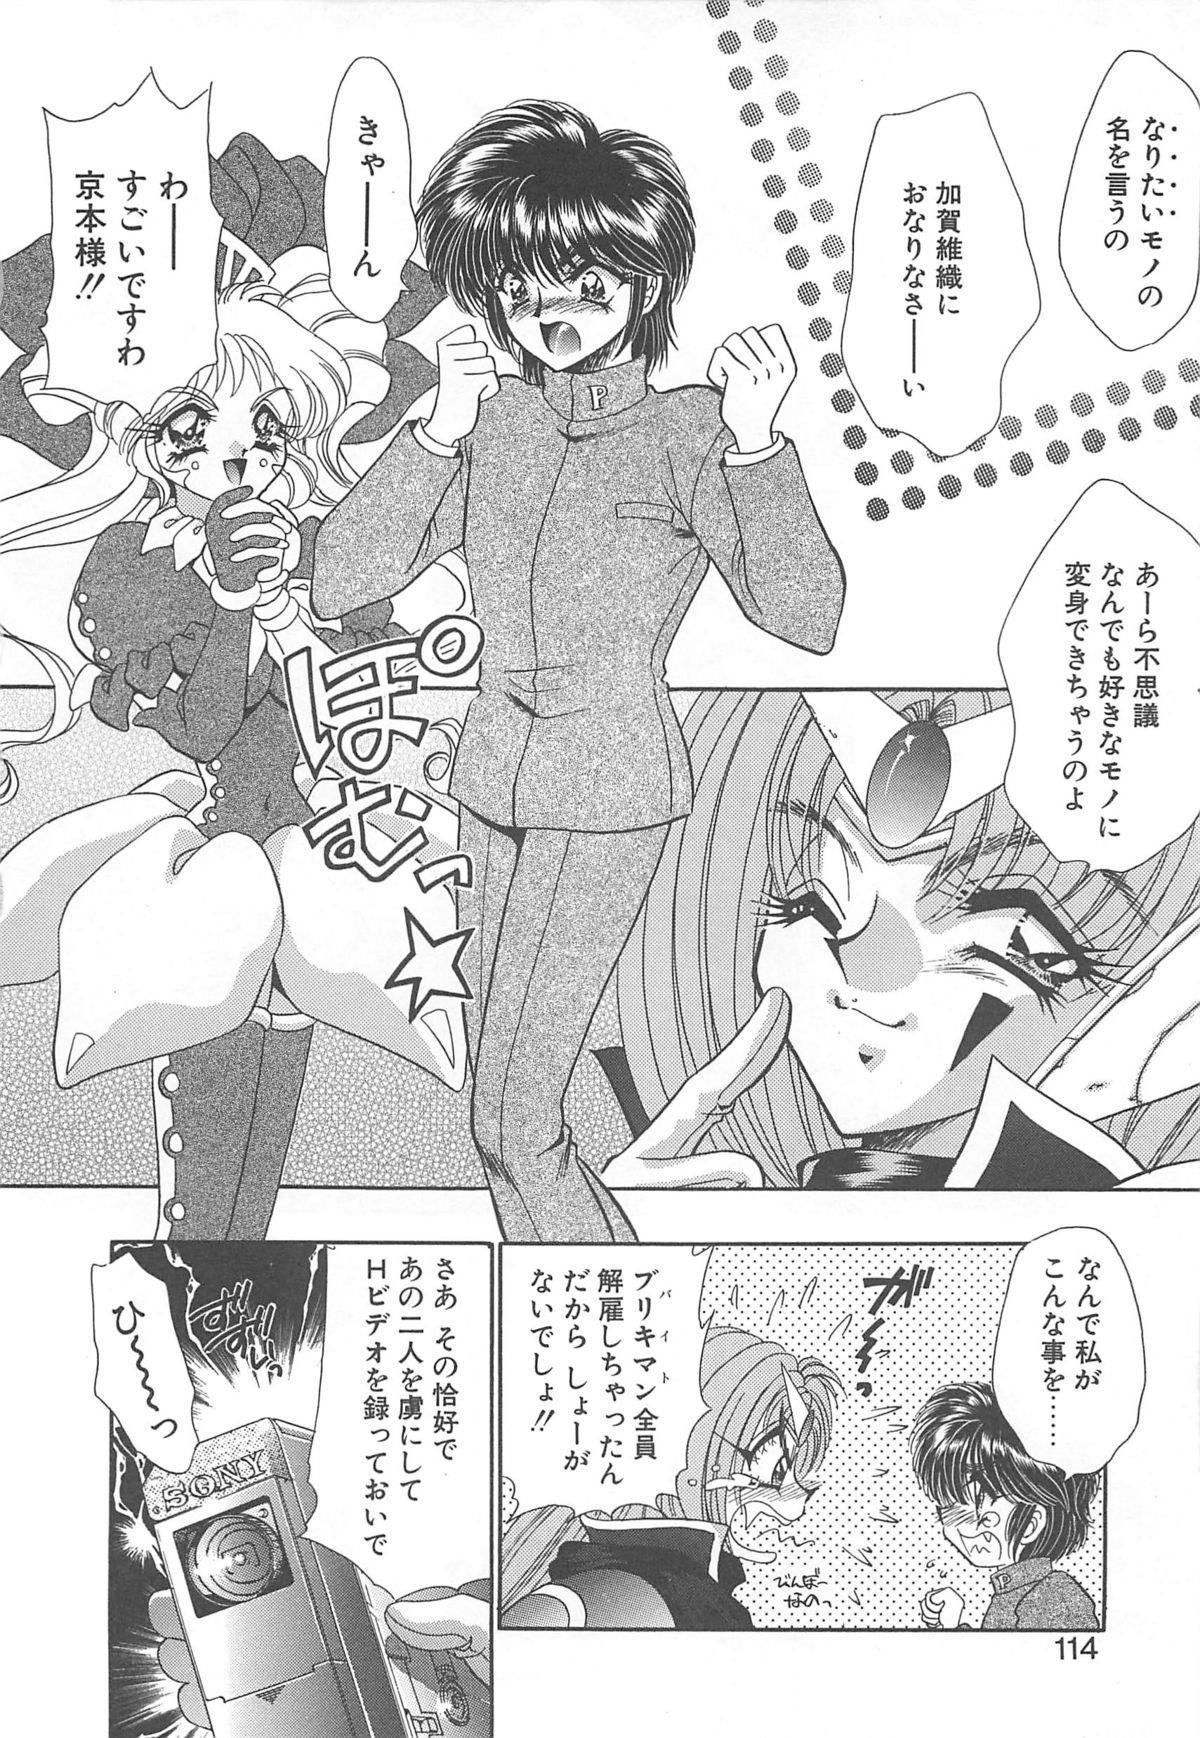 Kigurumi Sentai Quiltian 112